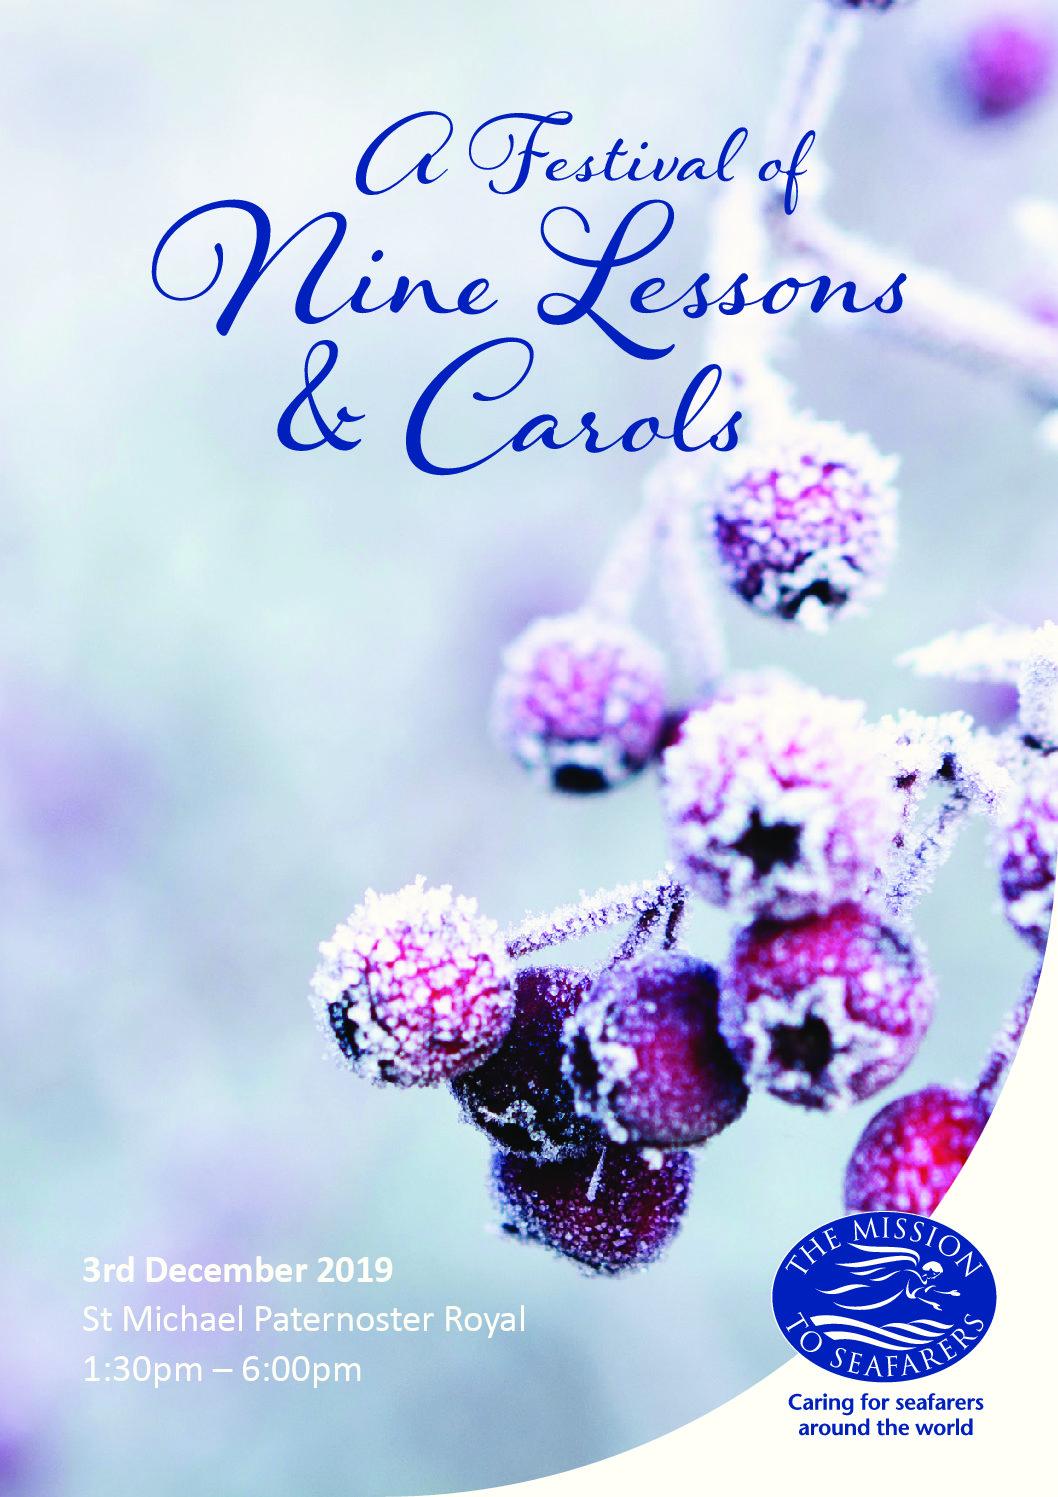 Festival of Nine Lessons and Carols 2019 – 3rd December